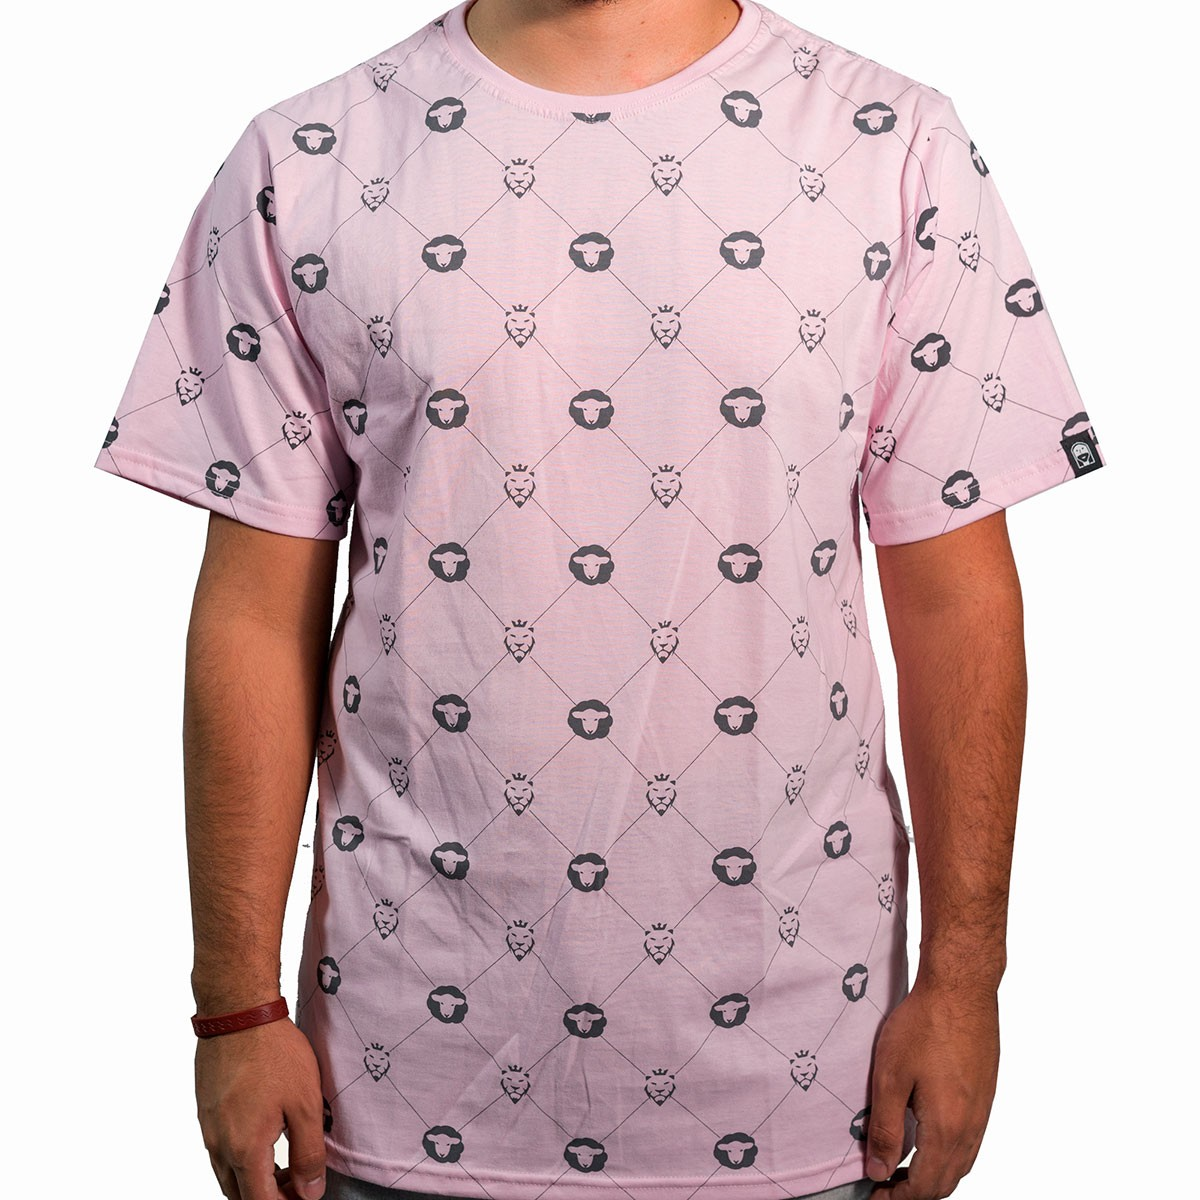 Camiseta Pattern Rosa Masculina - #REINODEPONTACABEÇA  - Jesuscopy